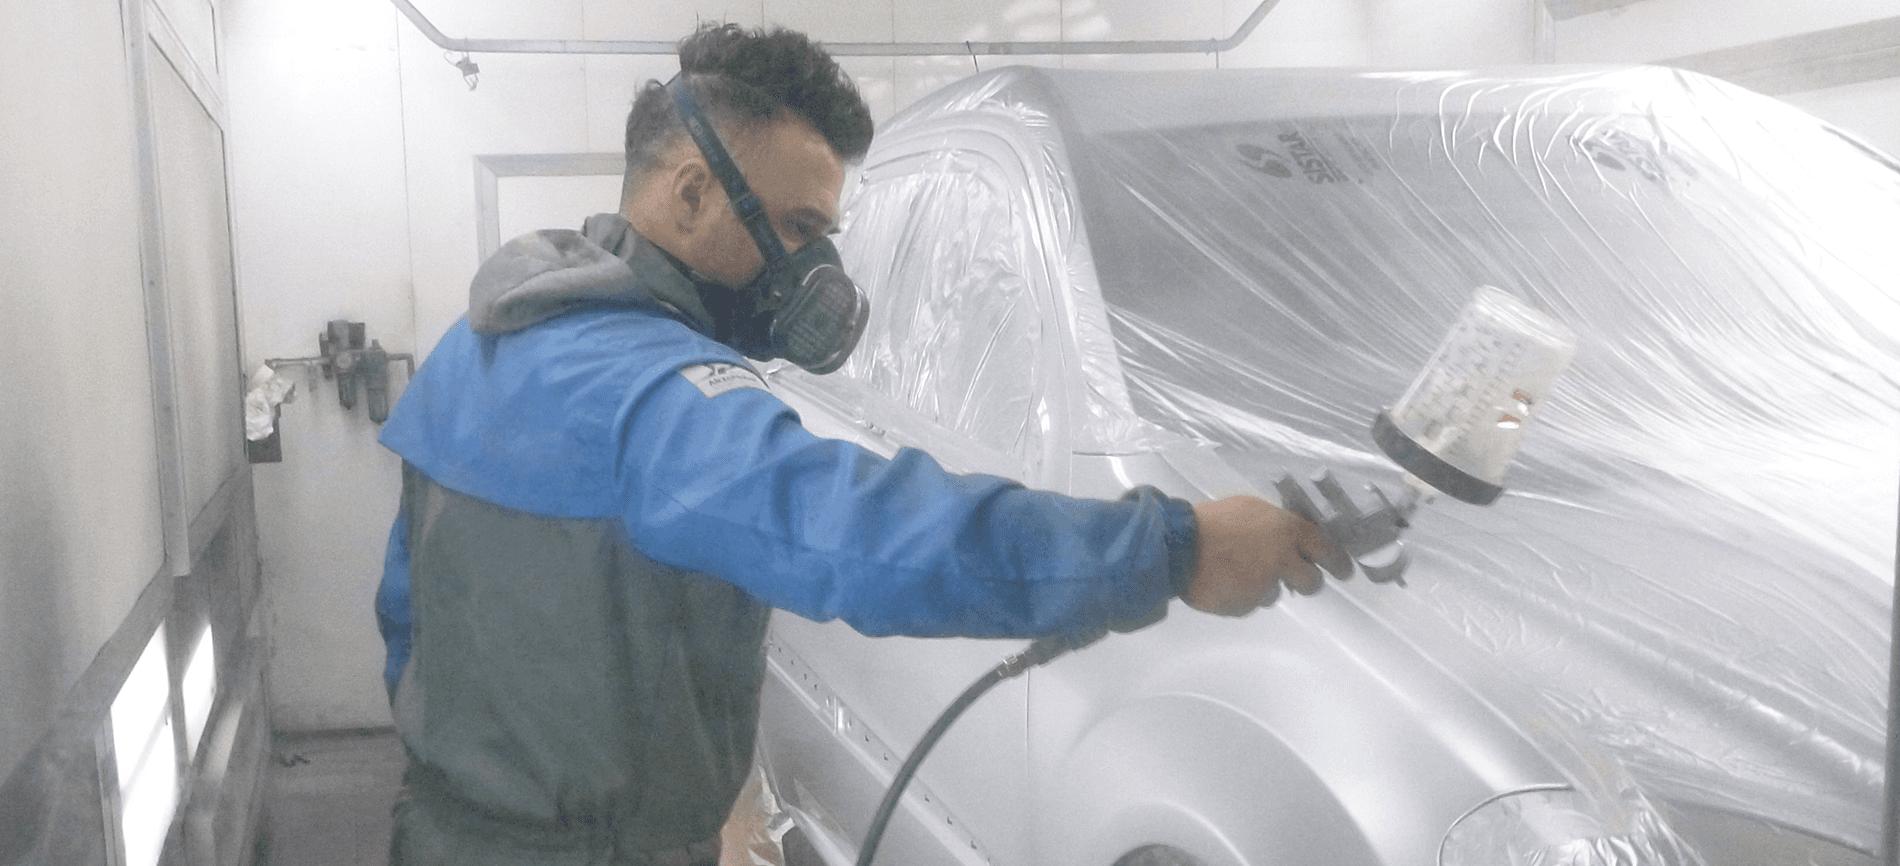 Carrozziere dipinge auto